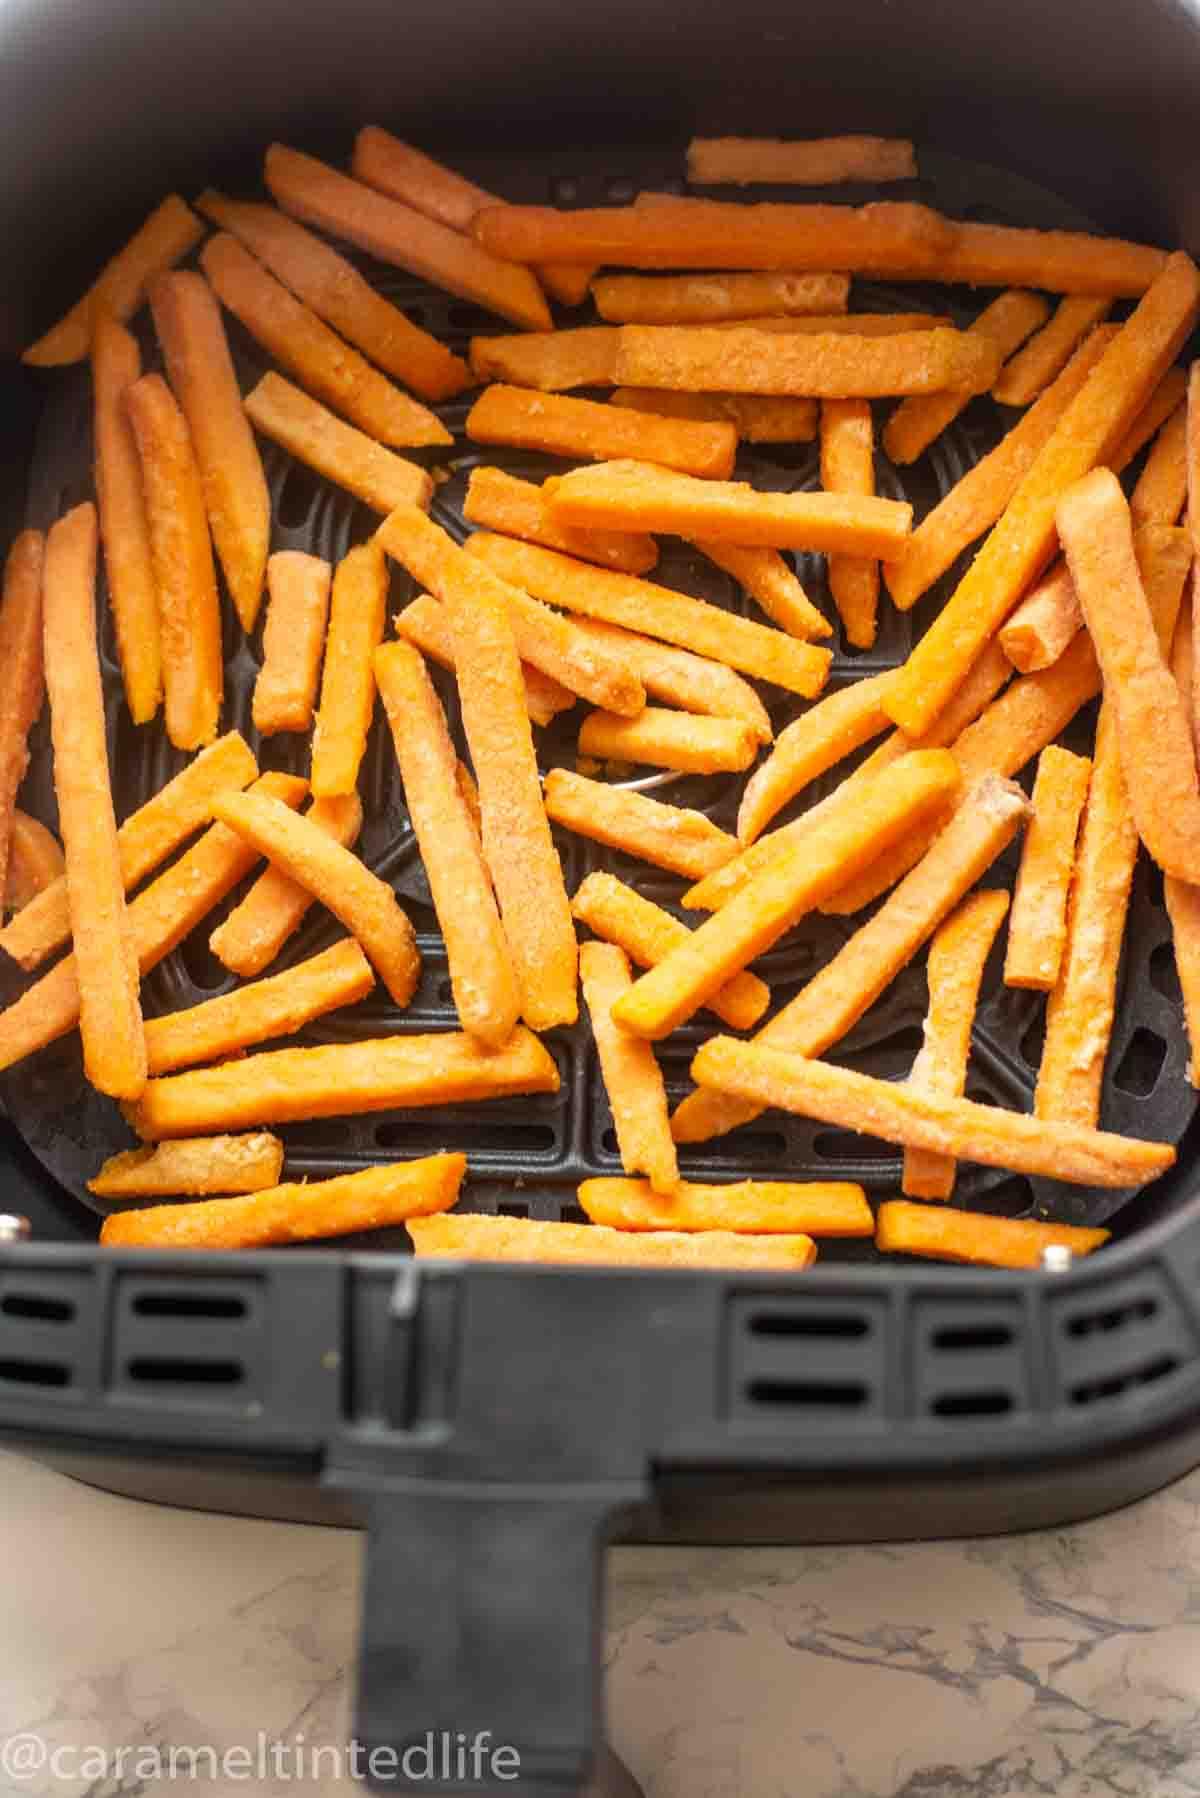 frozen sweet potato fries in an air fryer basket